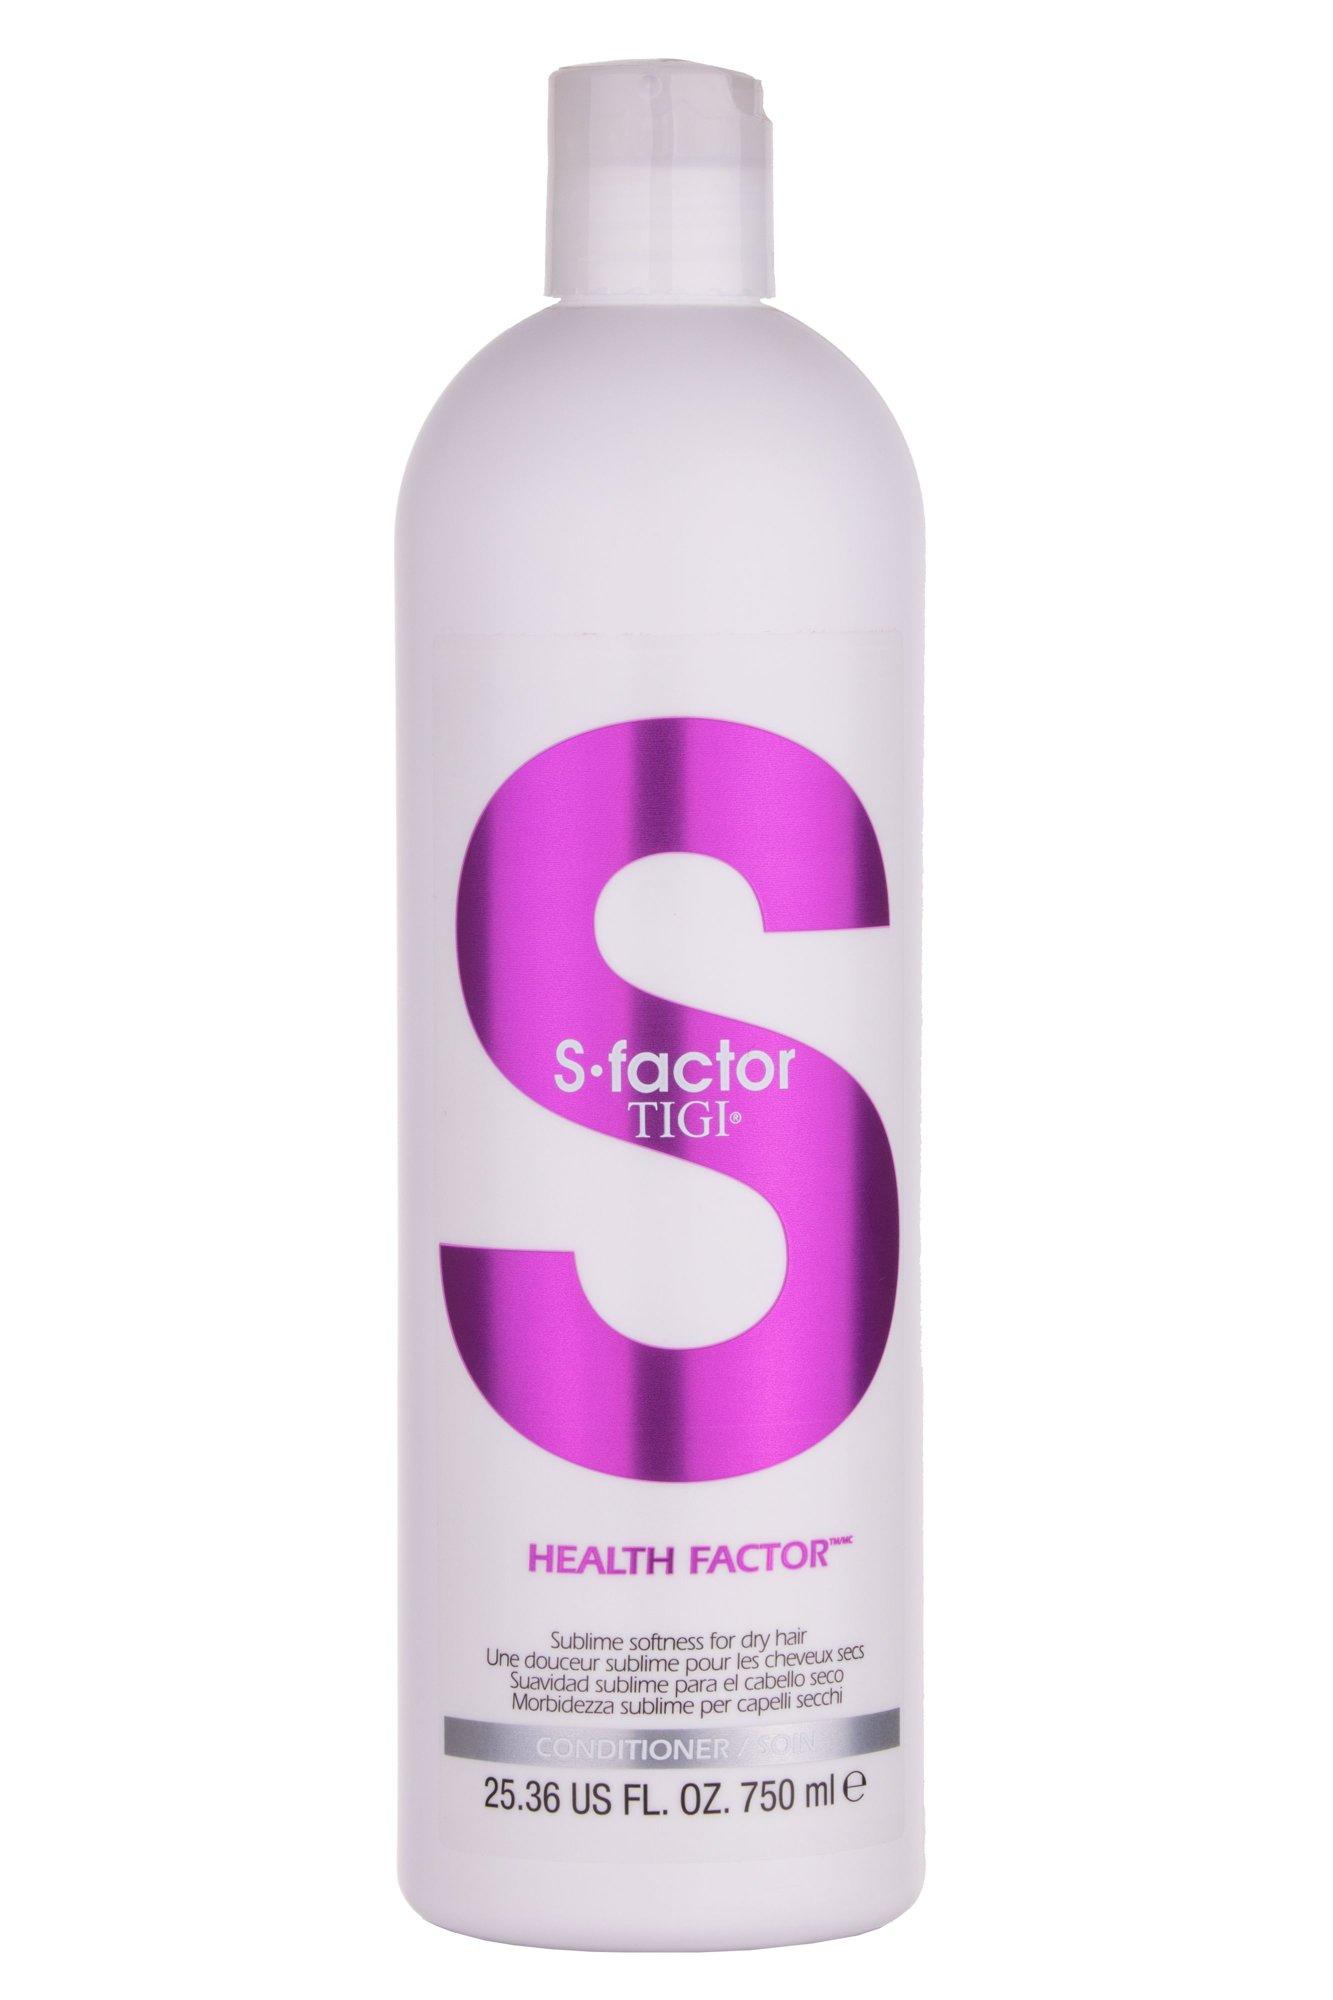 Tigi S Factor Health Factor Cosmetic 750ml